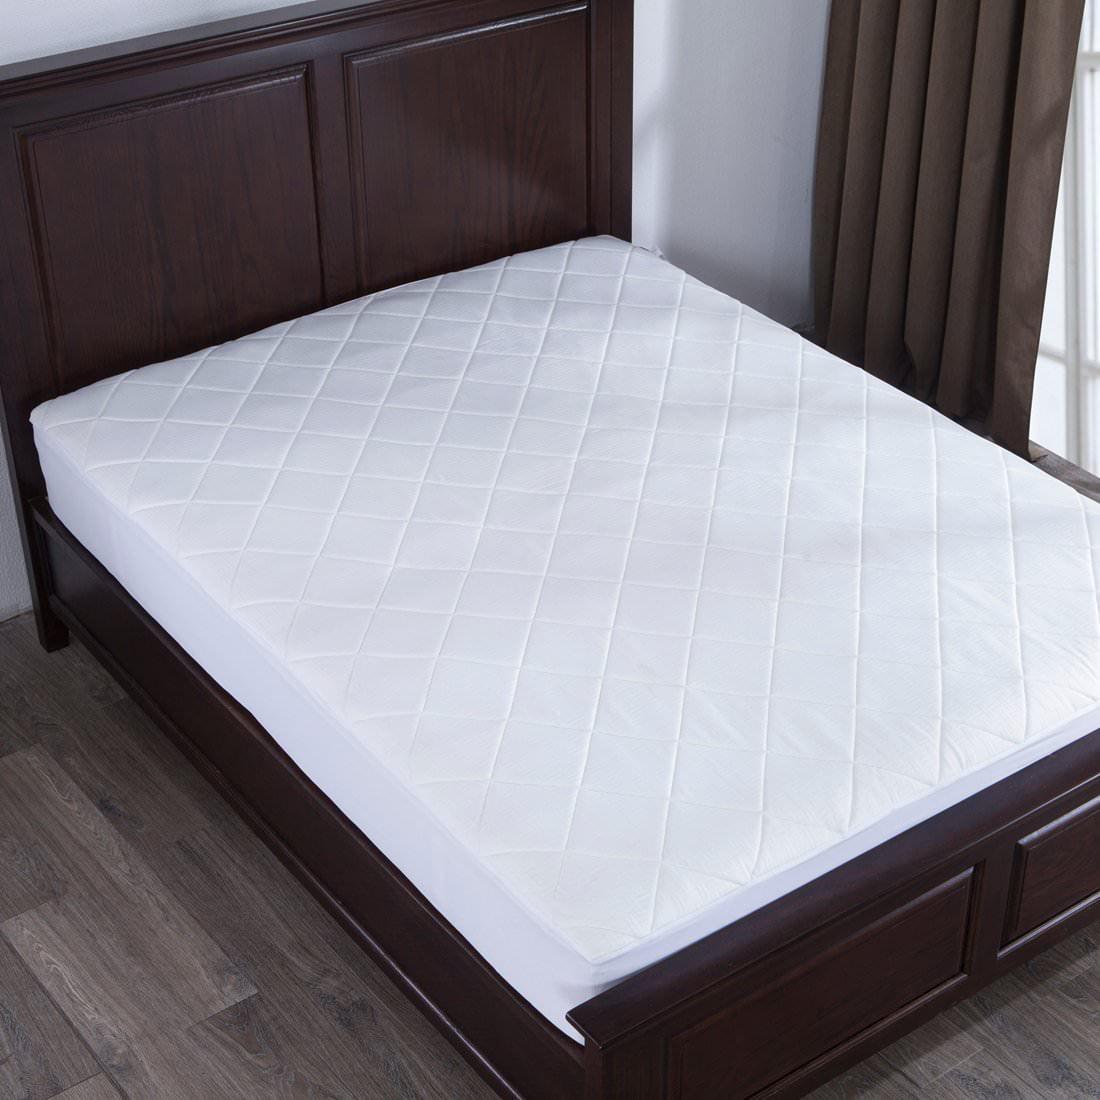 Puredown Memory Foam Mattress Pad Bed Topper, Diamond Quilting, King Size